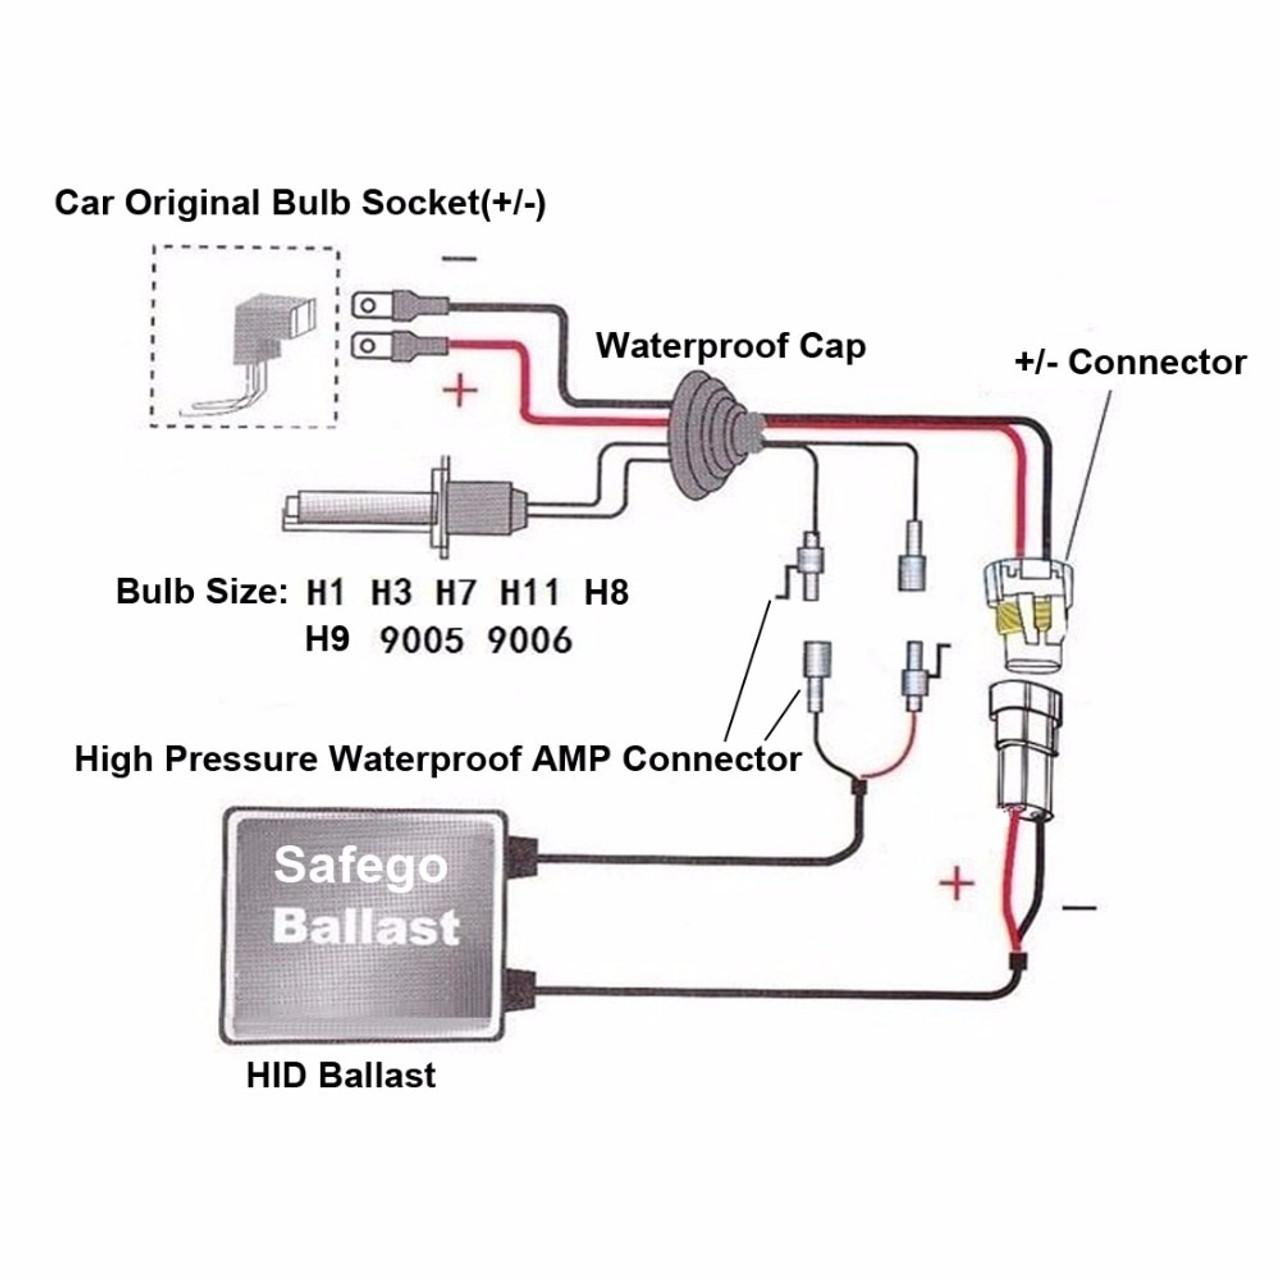 hight resolution of slim ballast hid kit xenon 35w h4 h7 h11 xenon hid conversion kit h1 corolla diy diy non hid 9005 9006 to h4 conversion diagram